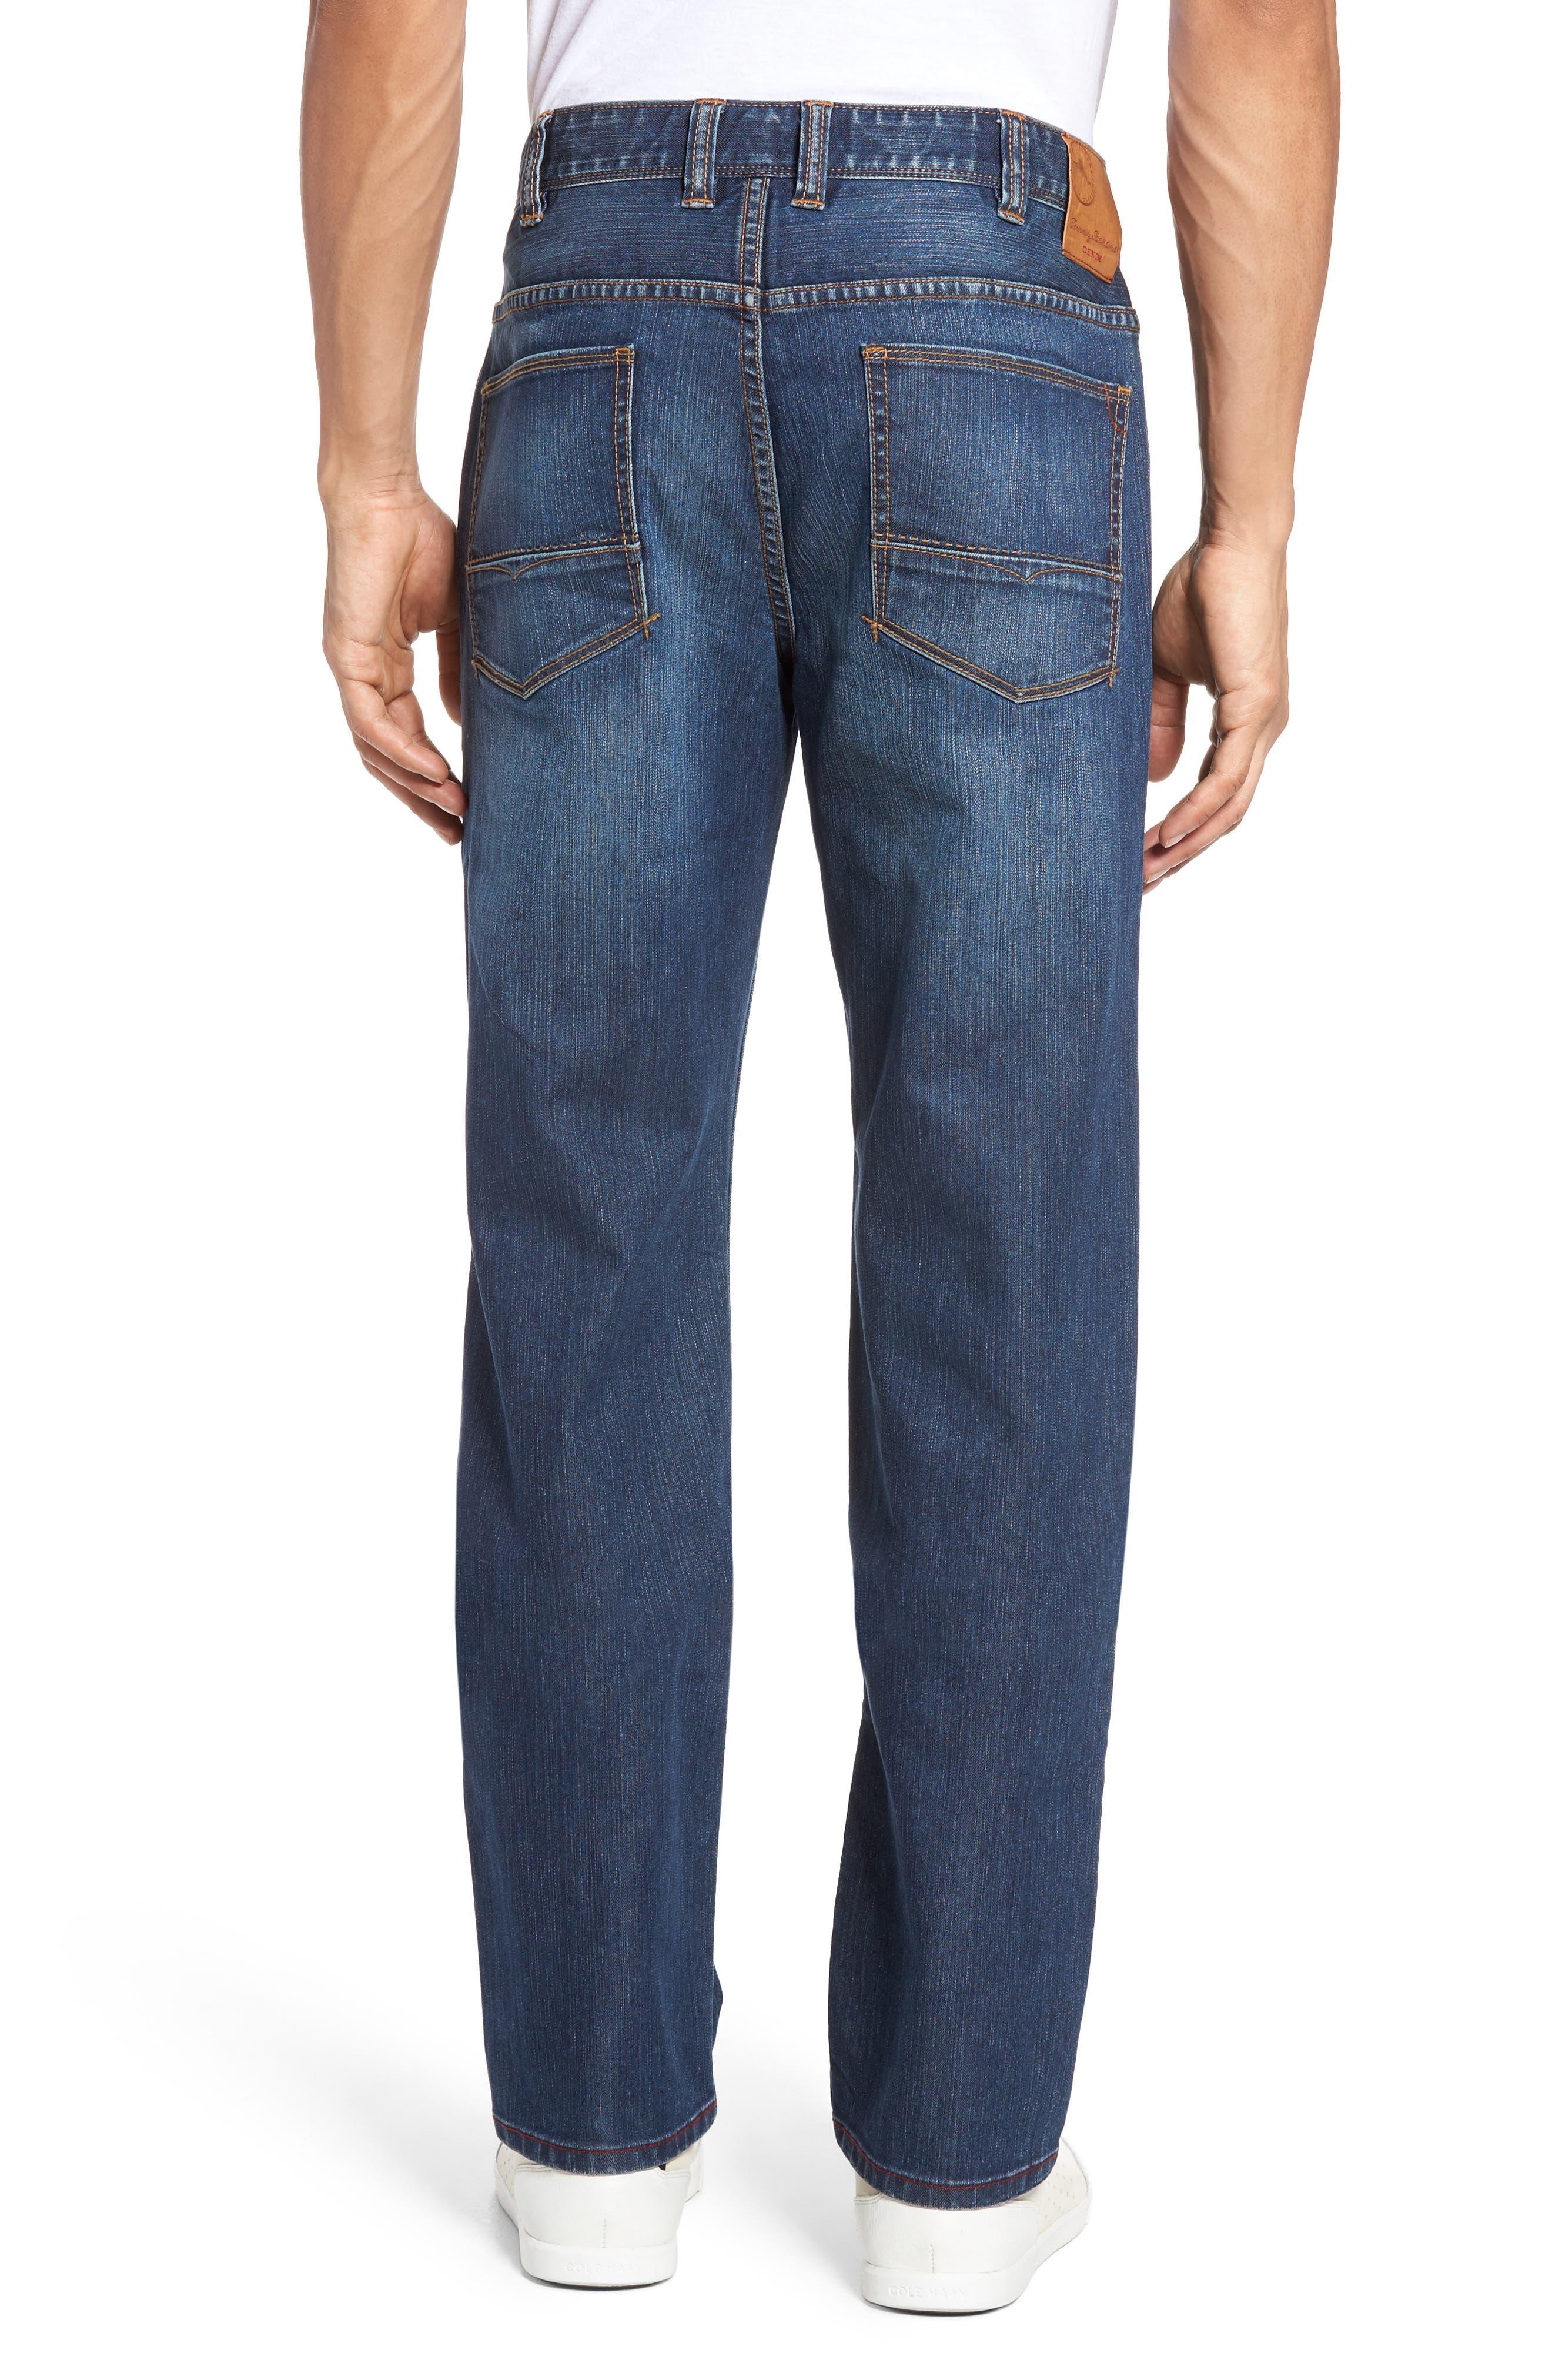 Sorrento Straight Leg Jeans,                             Alternate thumbnail 2, color,                             400